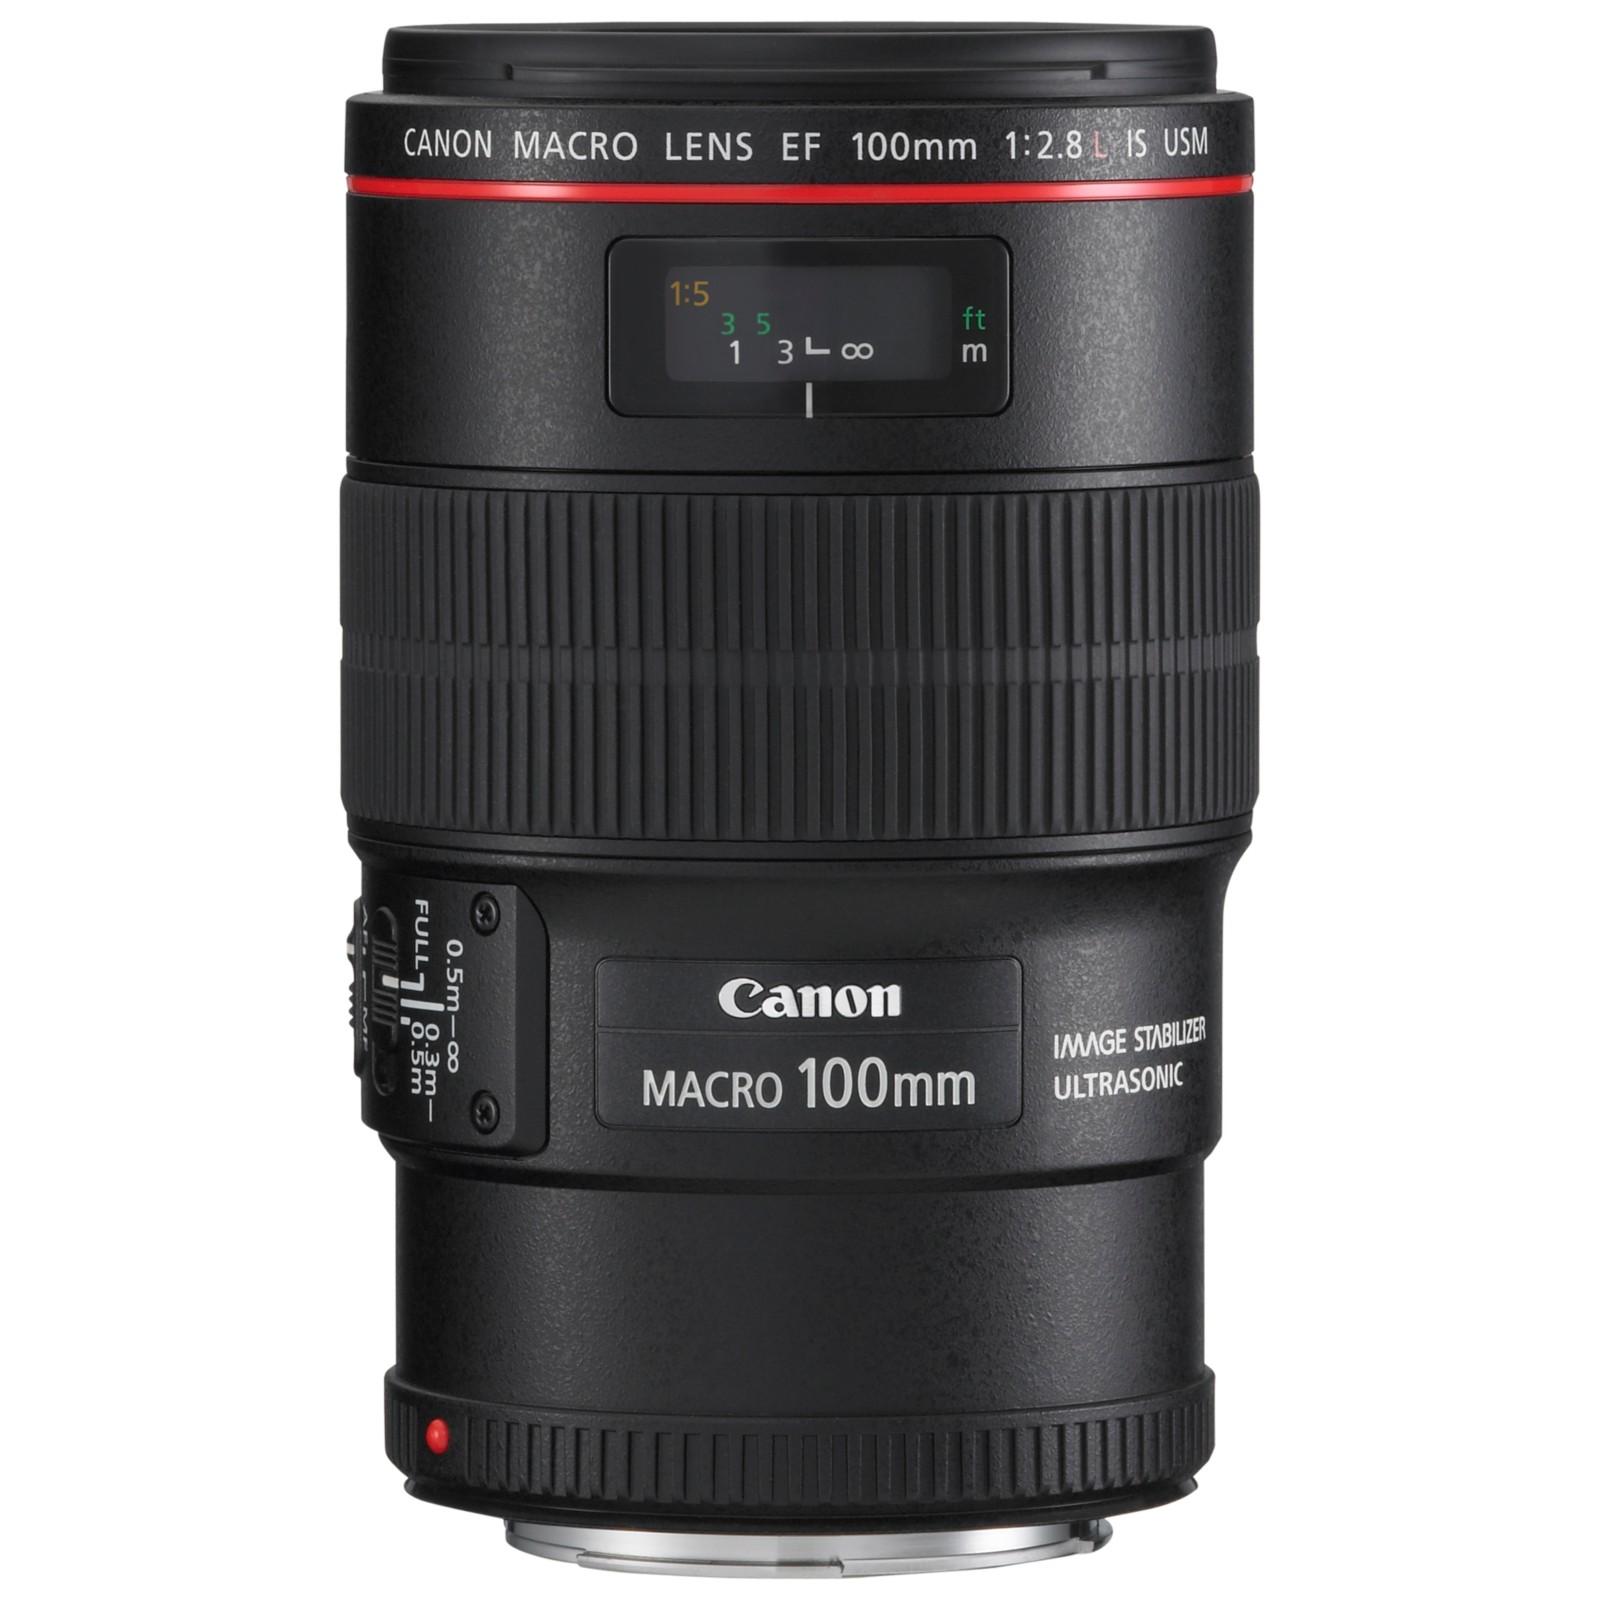 Canon EF 100mm f/2.8L IS USM Macro Lens